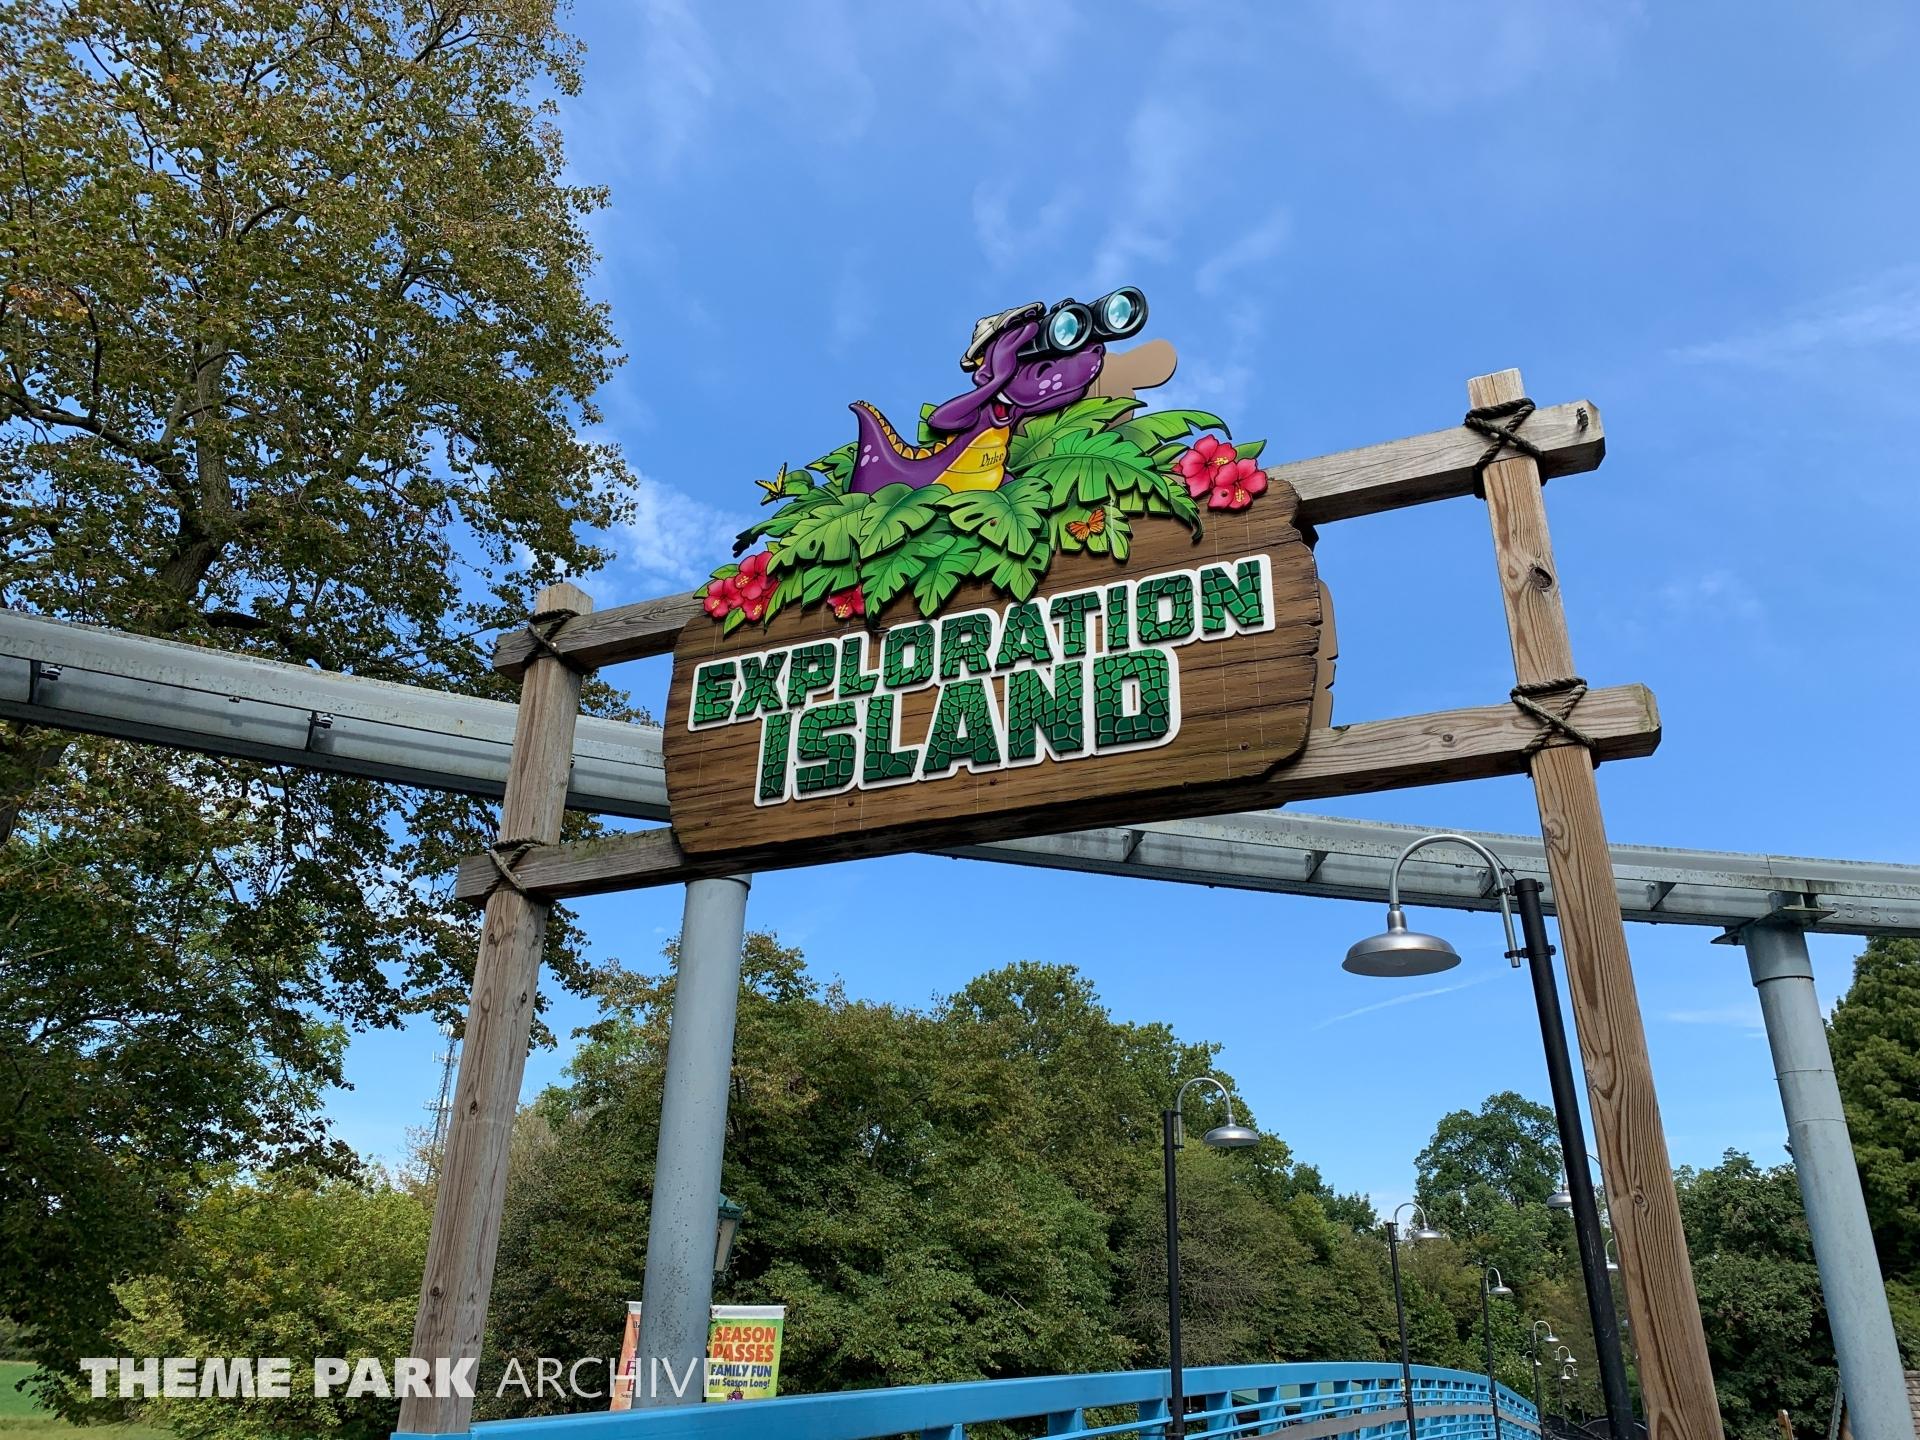 Exploration Island at Dutch Wonderland